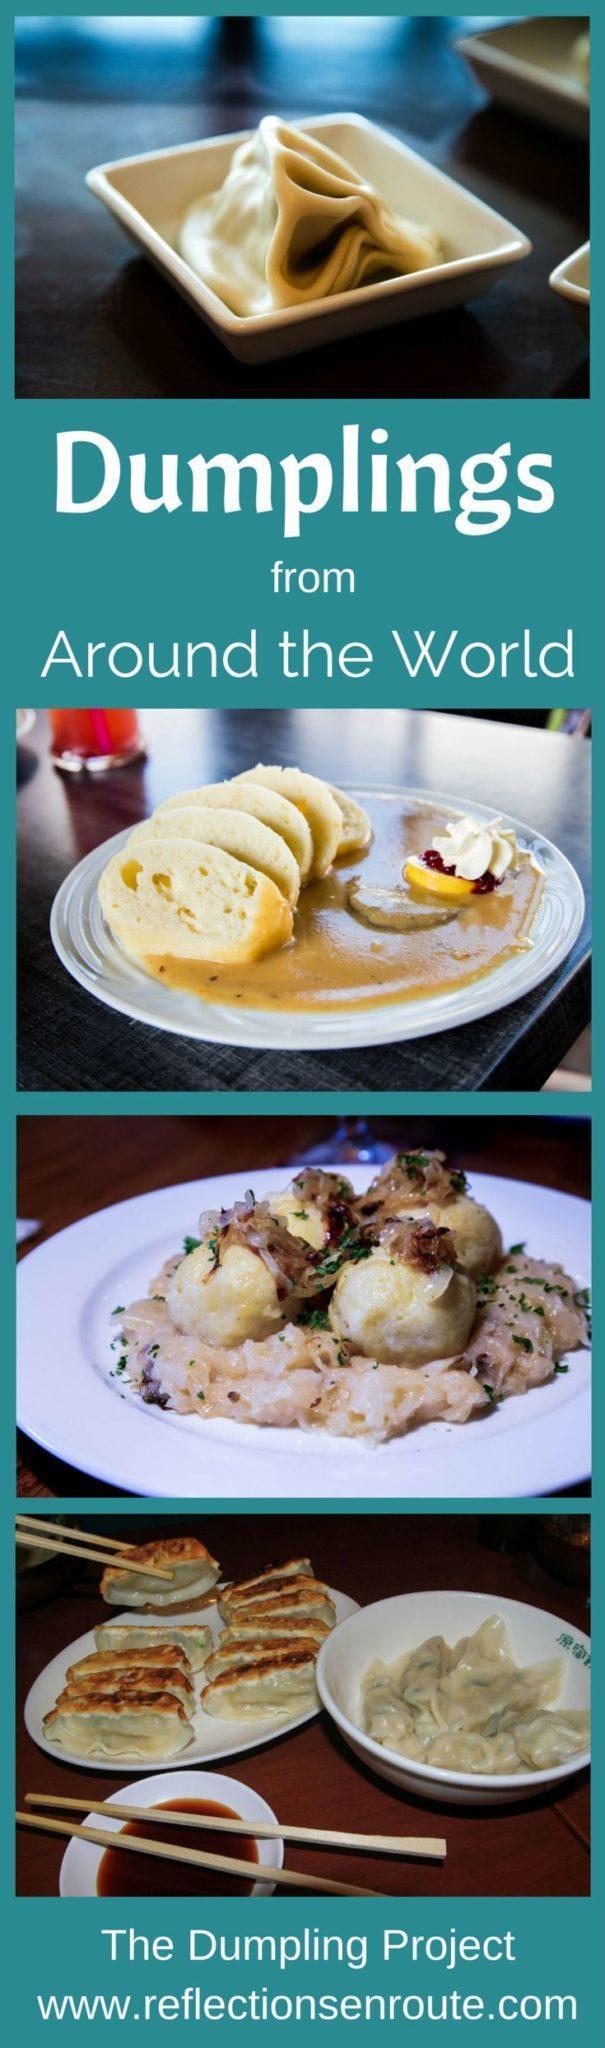 Dumplings Around the World - Everybody's comfort food.